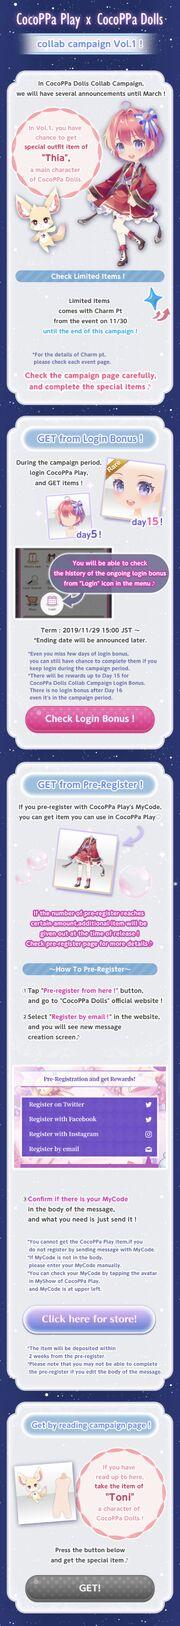 (Promotion) CocoPPa Dolls Collab Campaign - Collab Campaign Vol.1